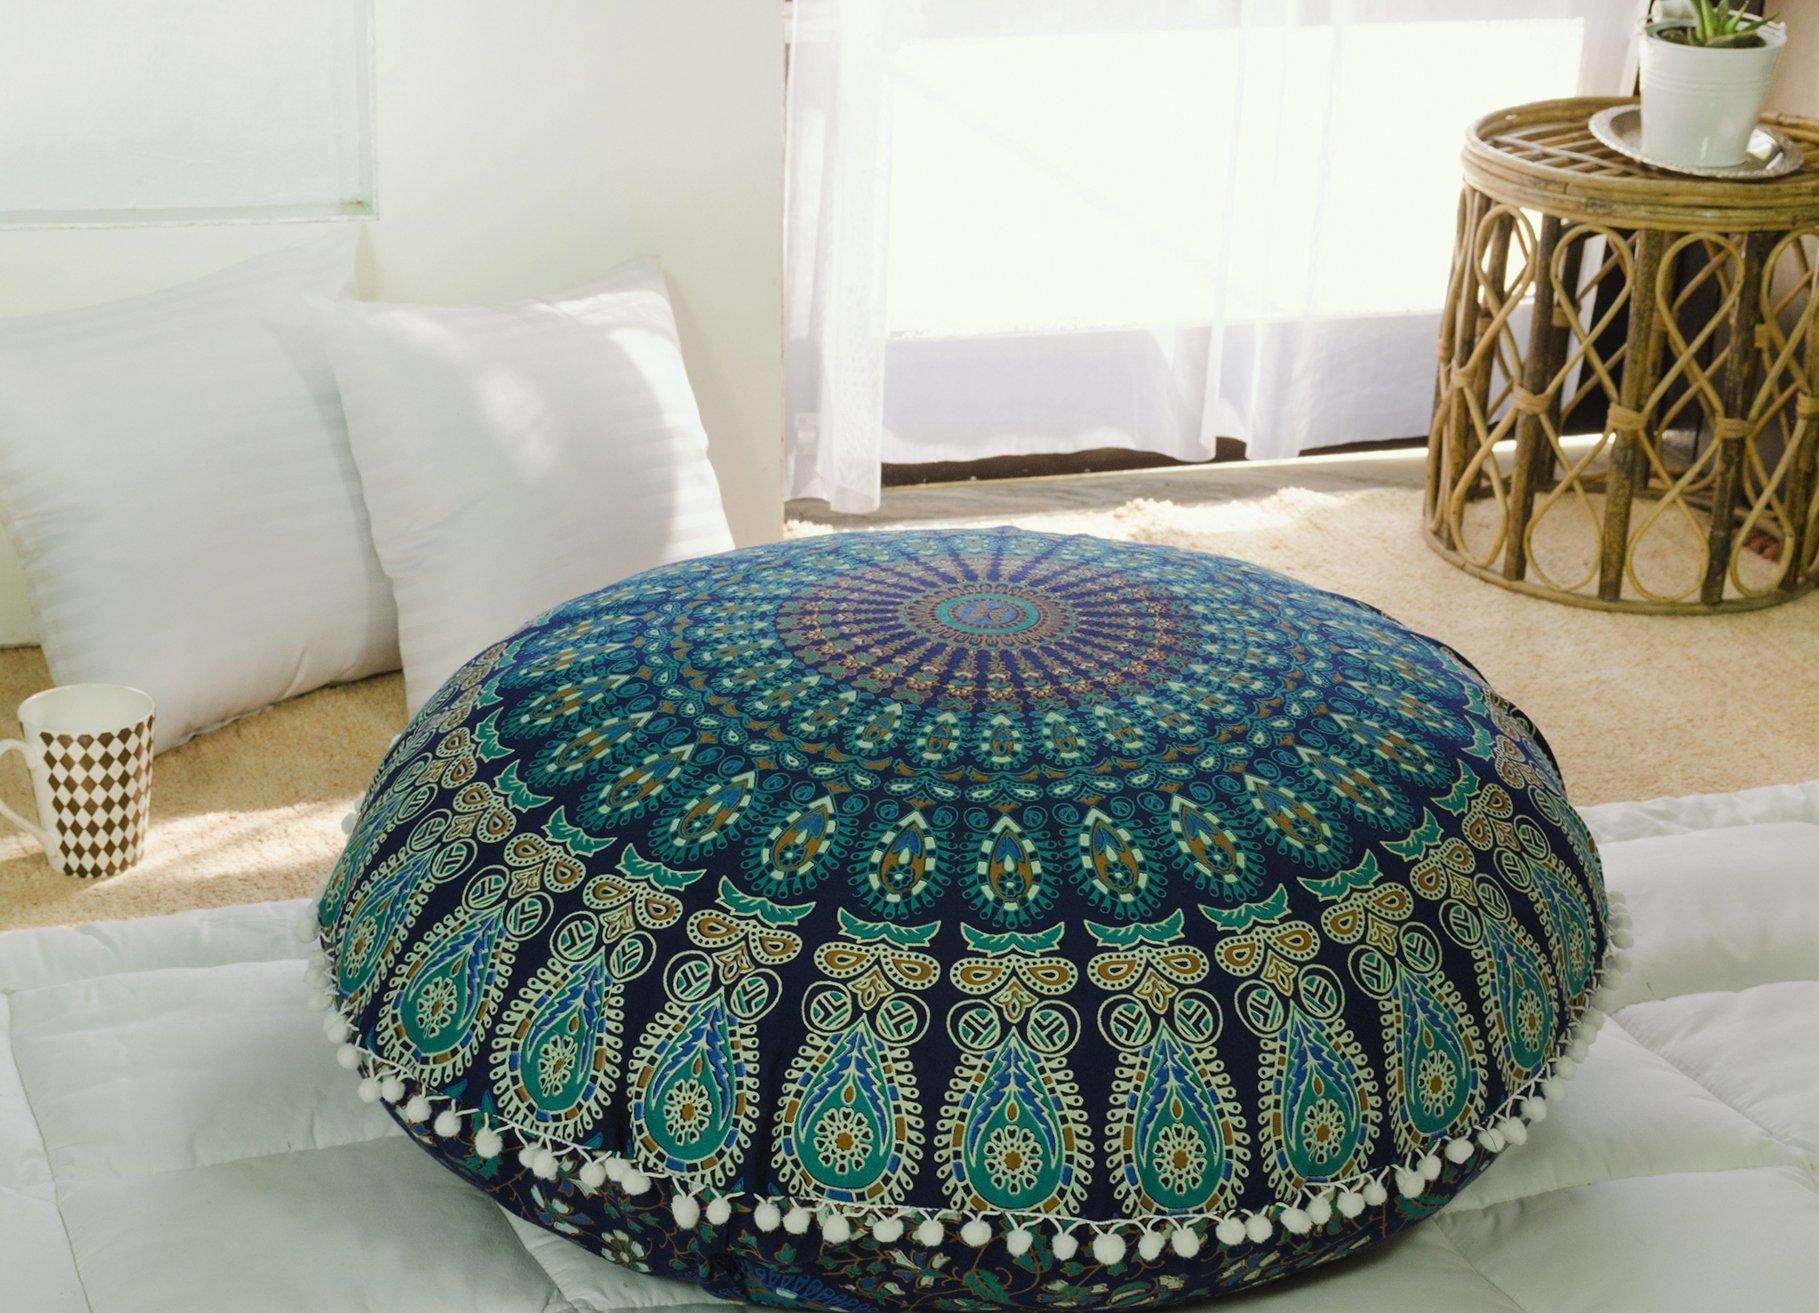 Popular Handicrafts Kp834 Large Hippie Mandala Floor Pillow - Cushion - Pouf Cover Round Bohemian Yoga Decor Floor Cushion Case- 32'' Blue Tarqouish